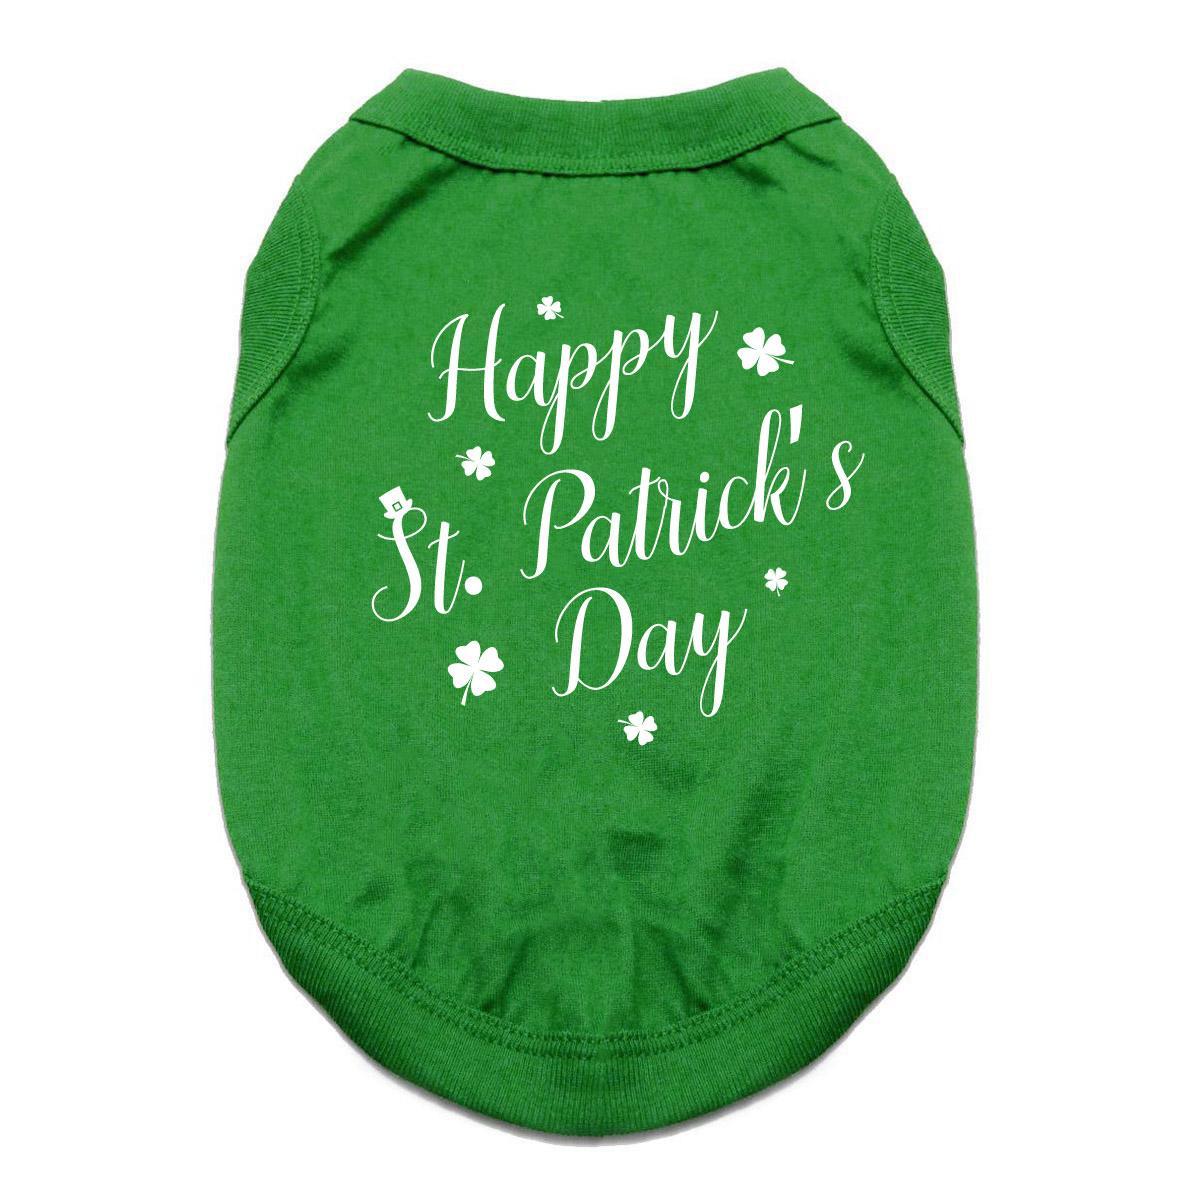 Happy St. Patrick's Day Dog Shirt - Green